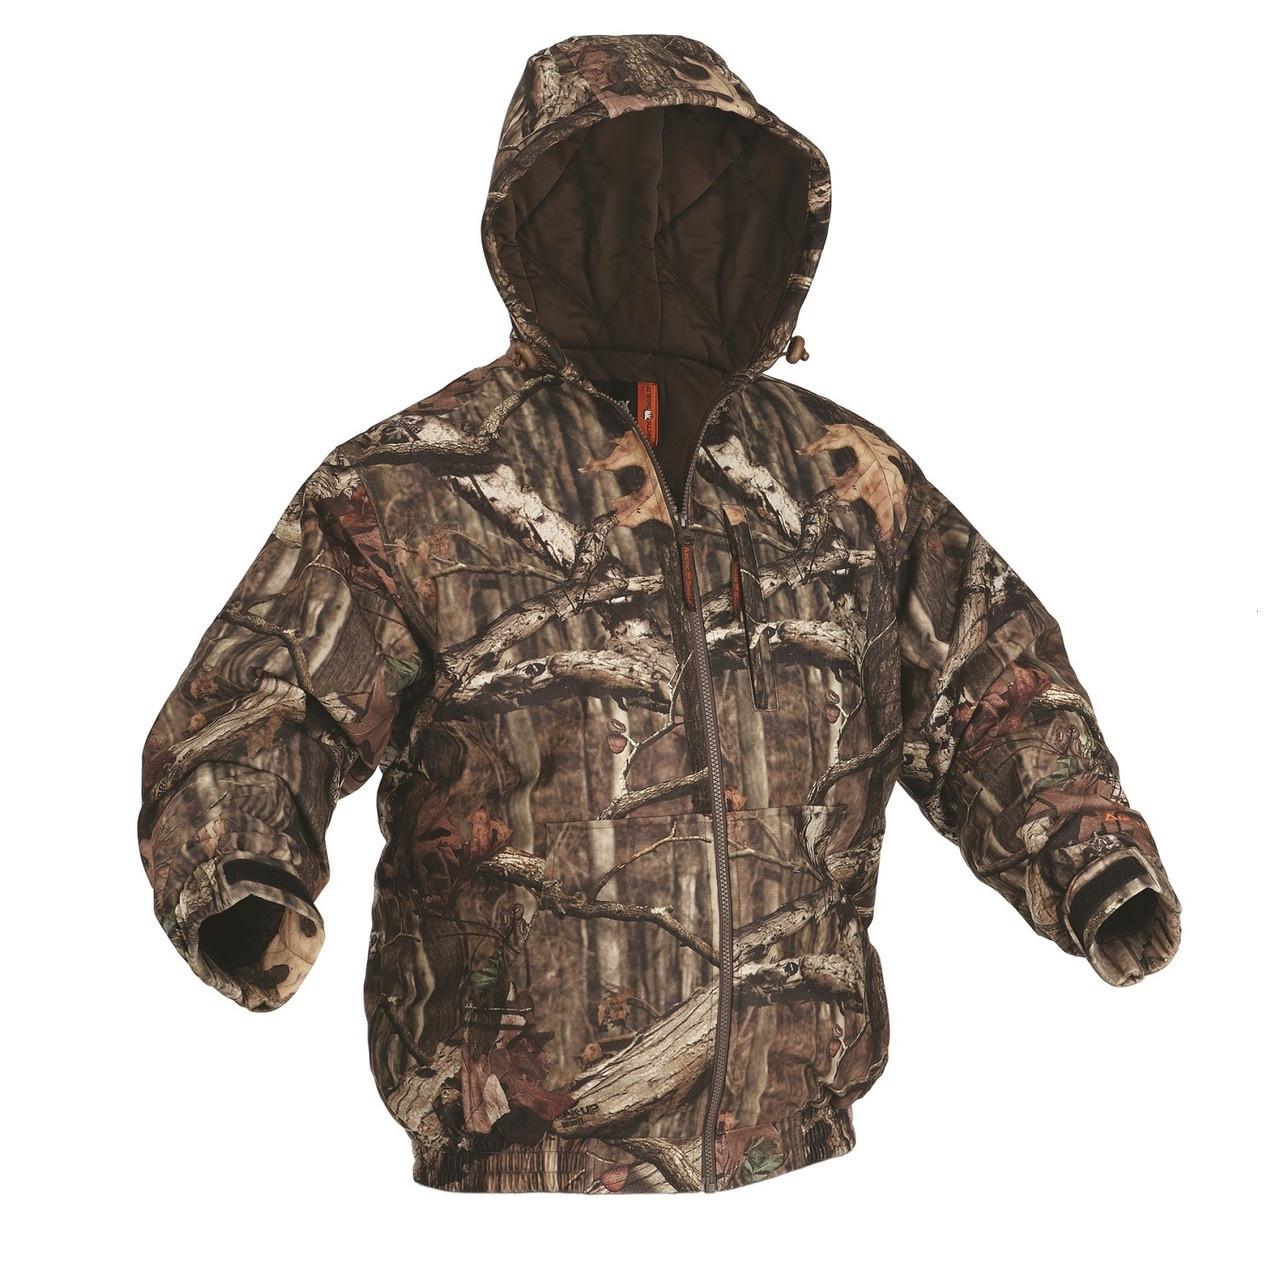 c5f93a5774bfb ArcticShield Quiet Tech Jacket-Mossy Oak Infinity-Large